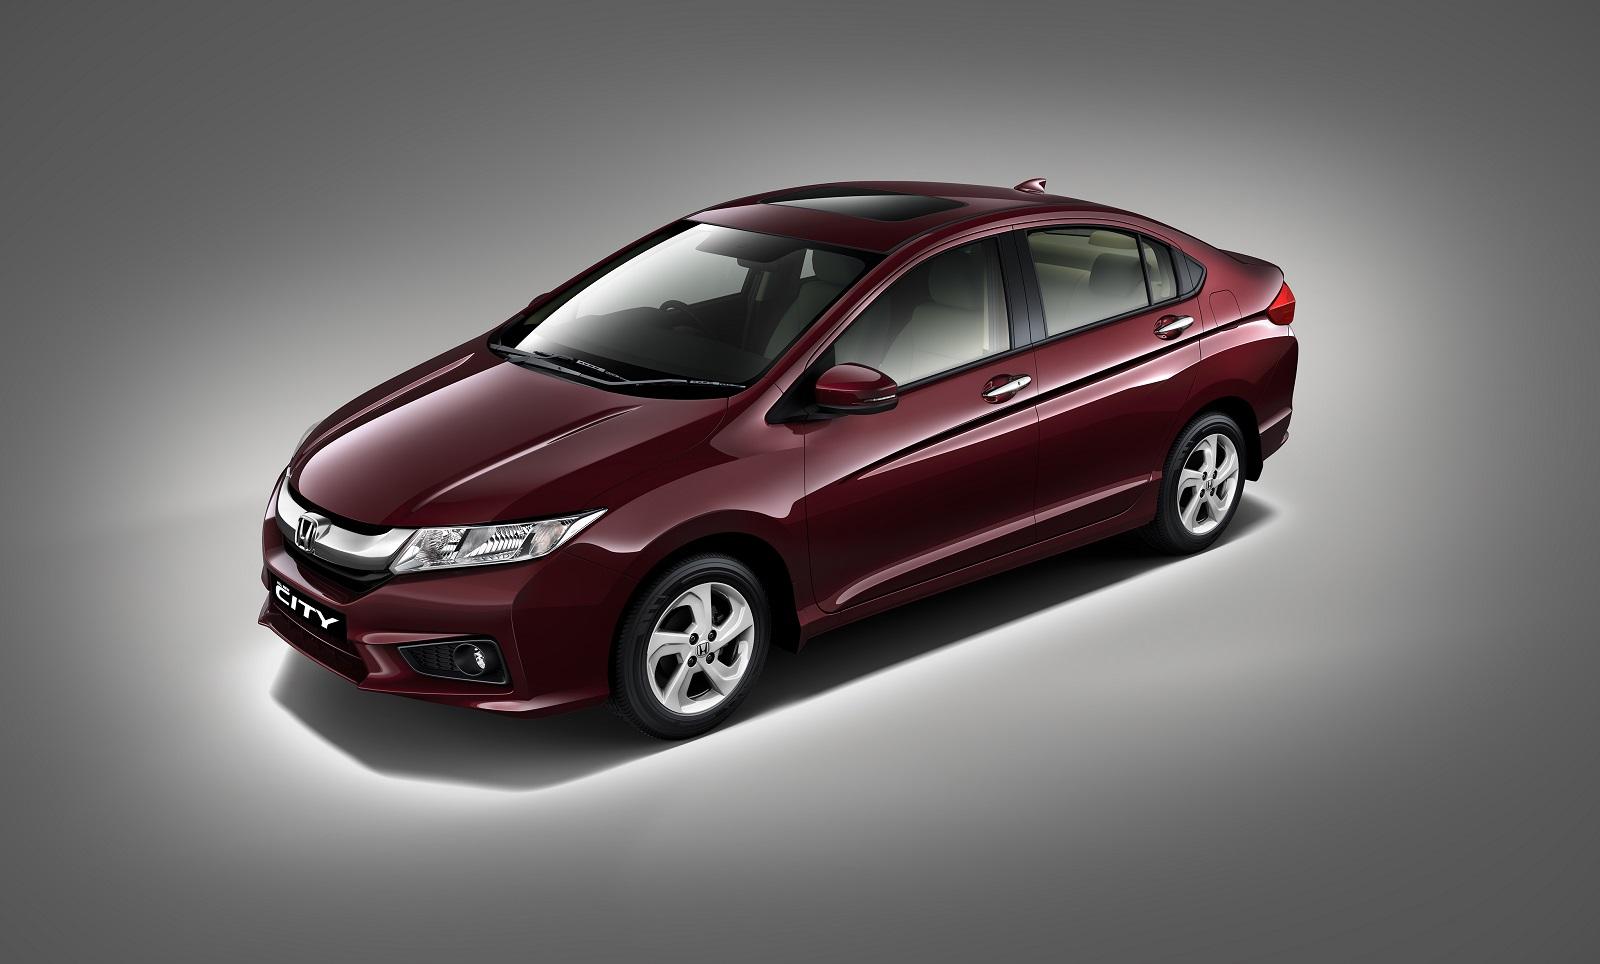 Is The 2015 Honda Fit Sedan India S Just Launched Honda City